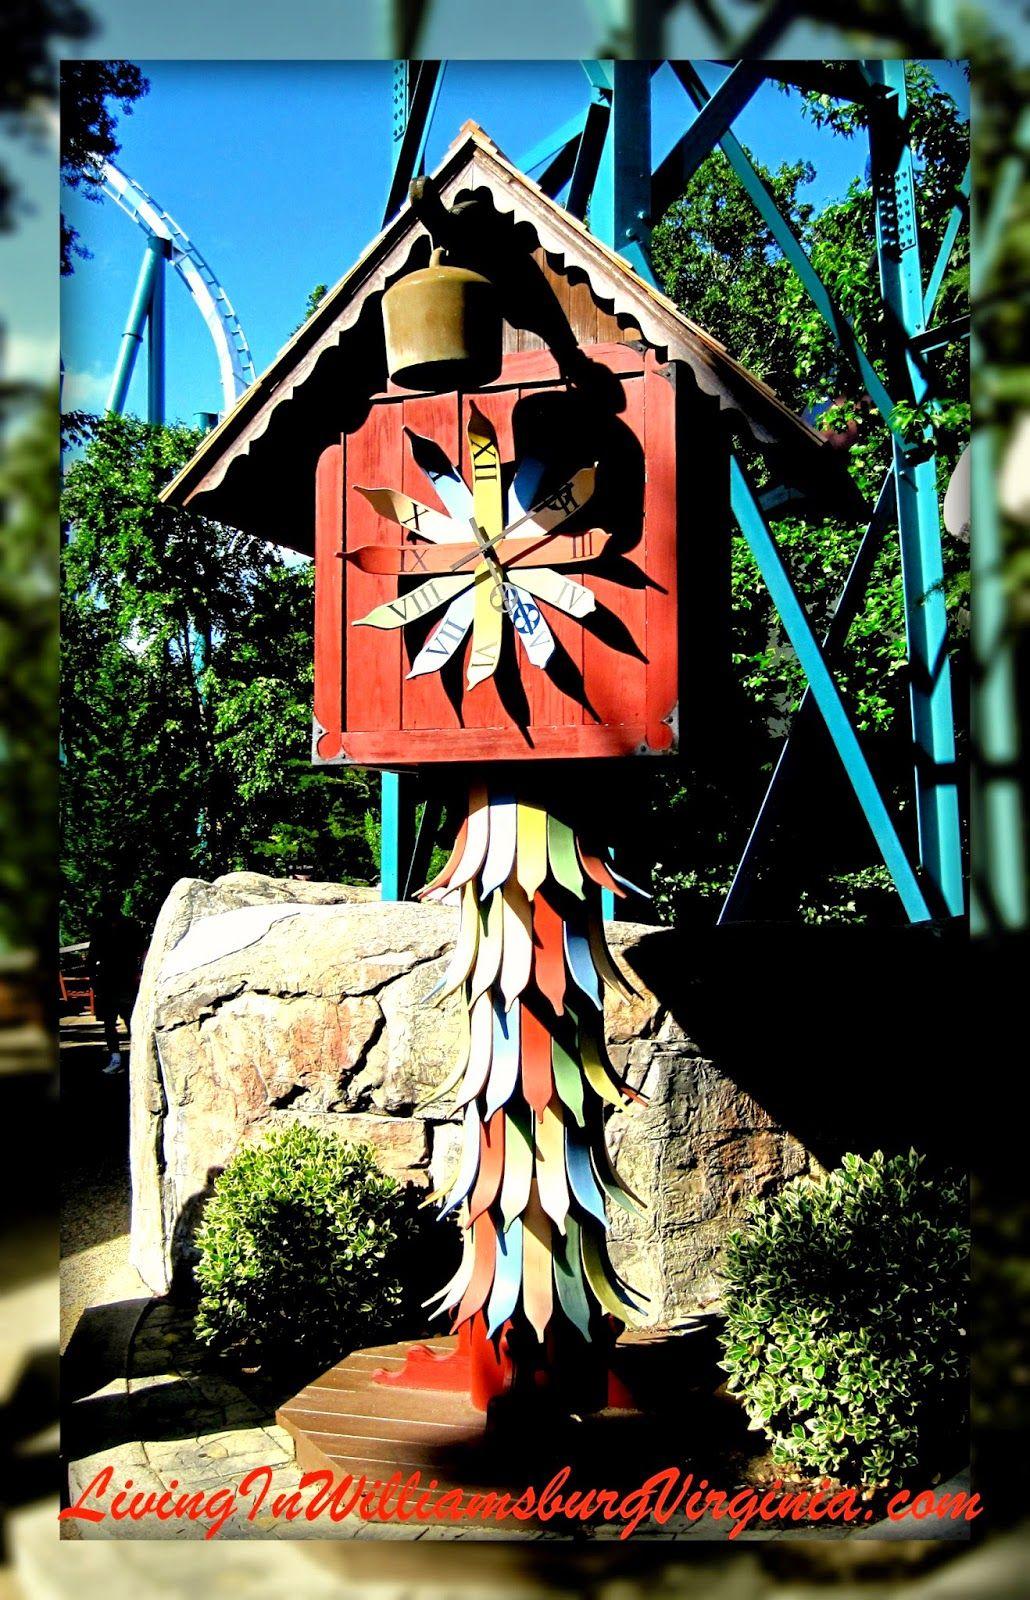 52fd26e2884bf831f935498e95ae1ec9 - Airport Closest To Busch Gardens Williamsburg